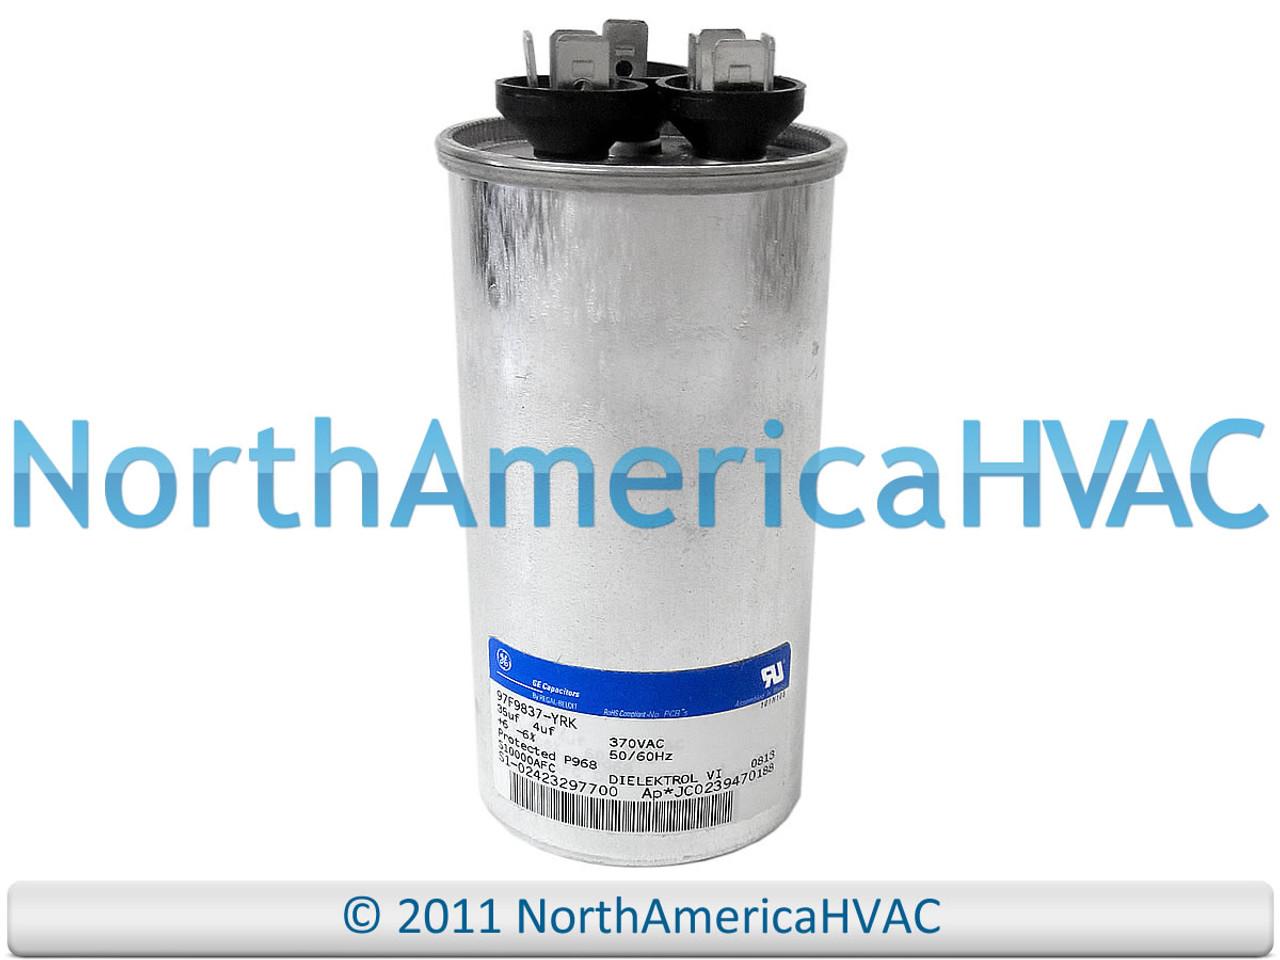 Amrad Capacitor Dual Run Oval 45//7.5 45.0//7.5 uf MFD 440 VAC VA2000//44 456+755